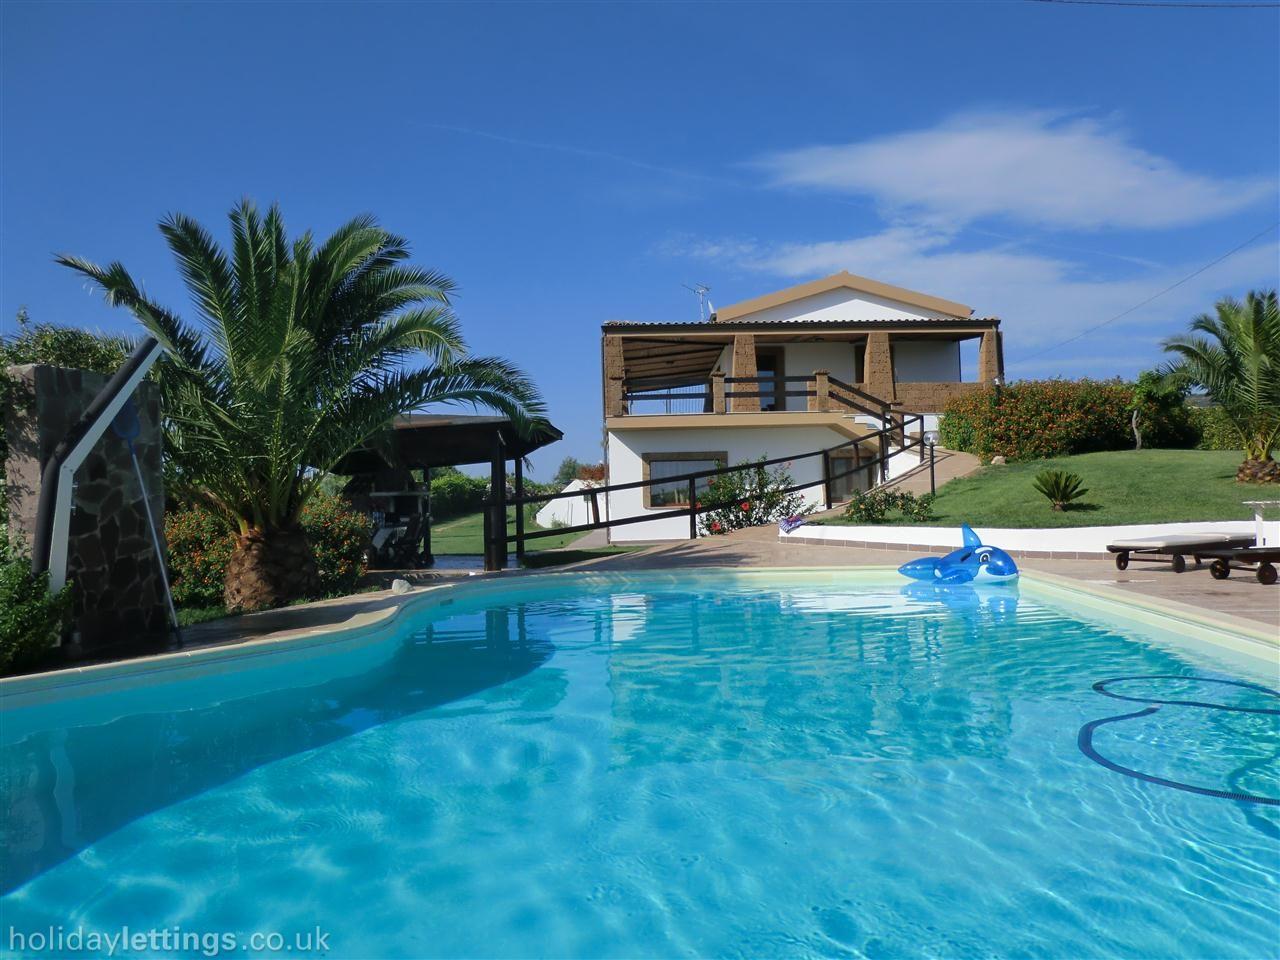 Sardinia 10 - 5 bedroom villa in Alghero to rent from £ ...